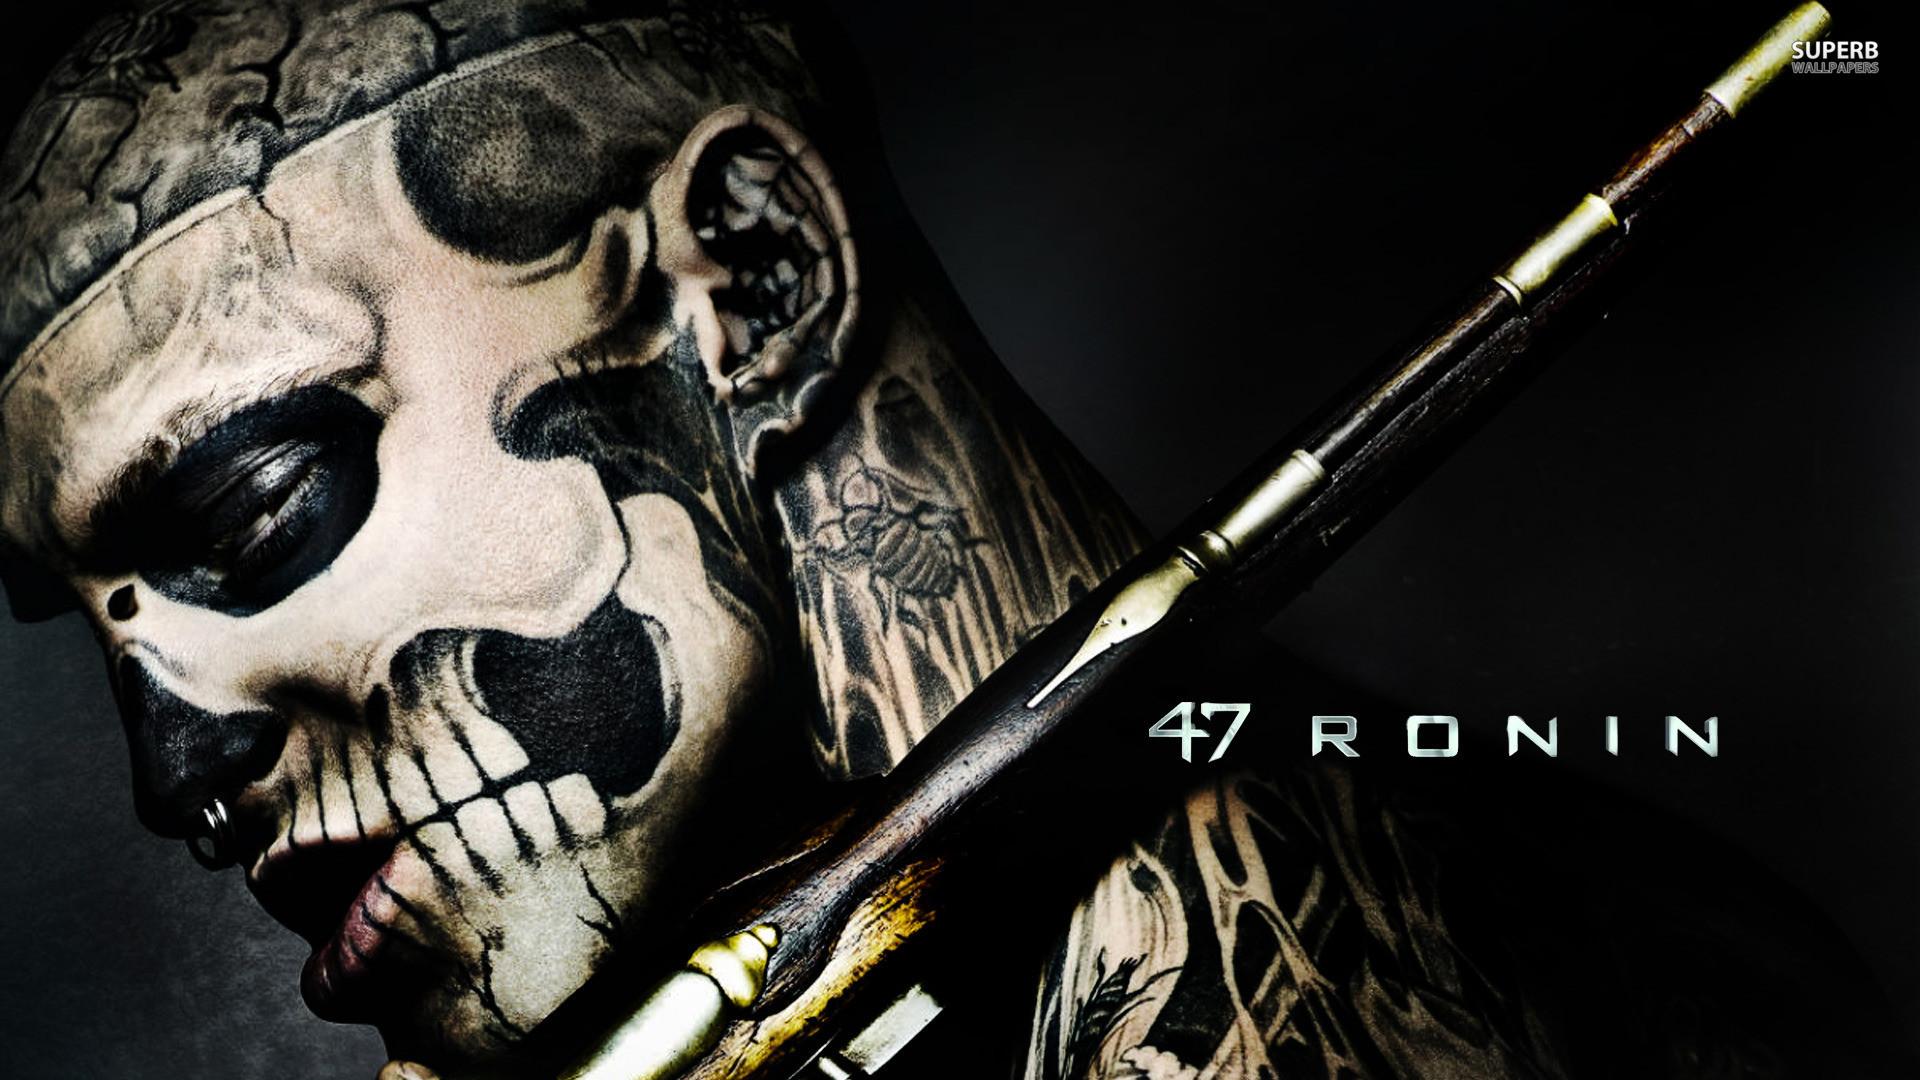 Zombie Boy 47 ronin